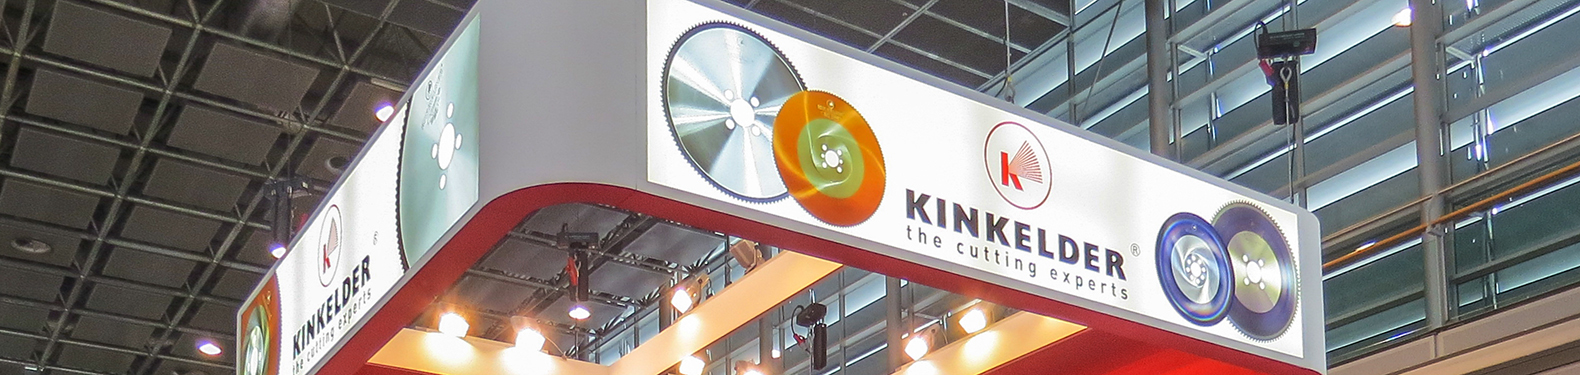 Header Kinkelder website